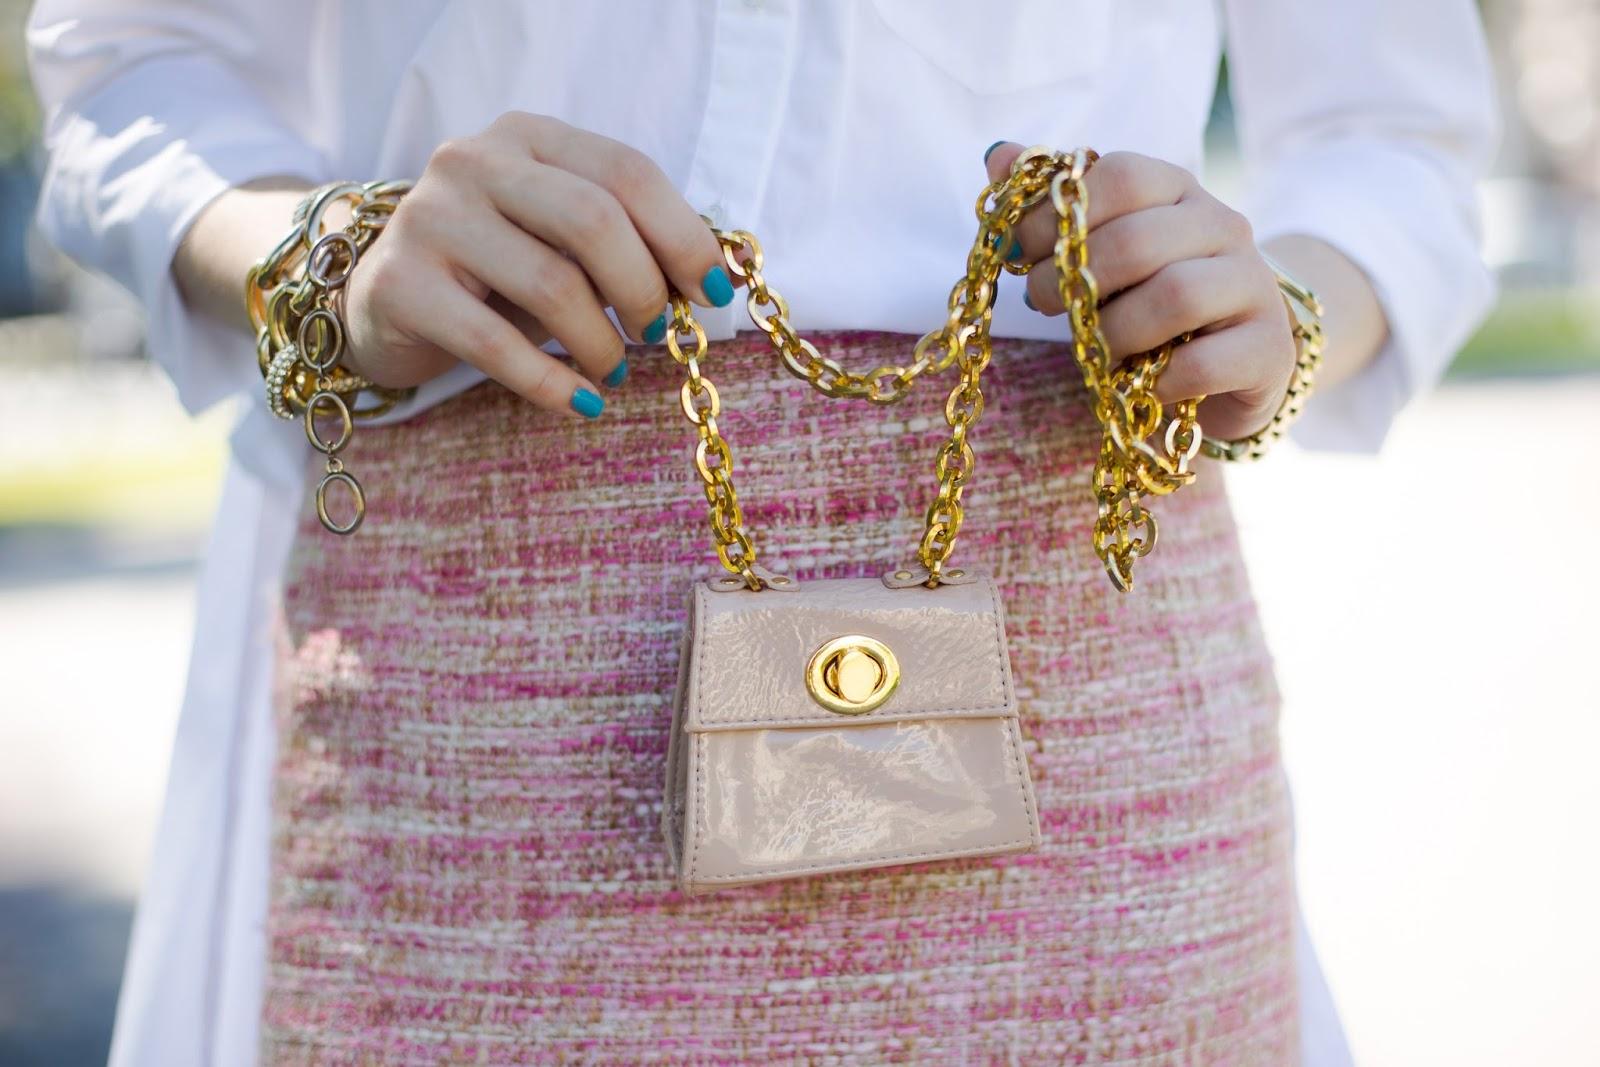 tiny bag, micro bag, микро сумки фото, уличный стиль 2015 лето фото